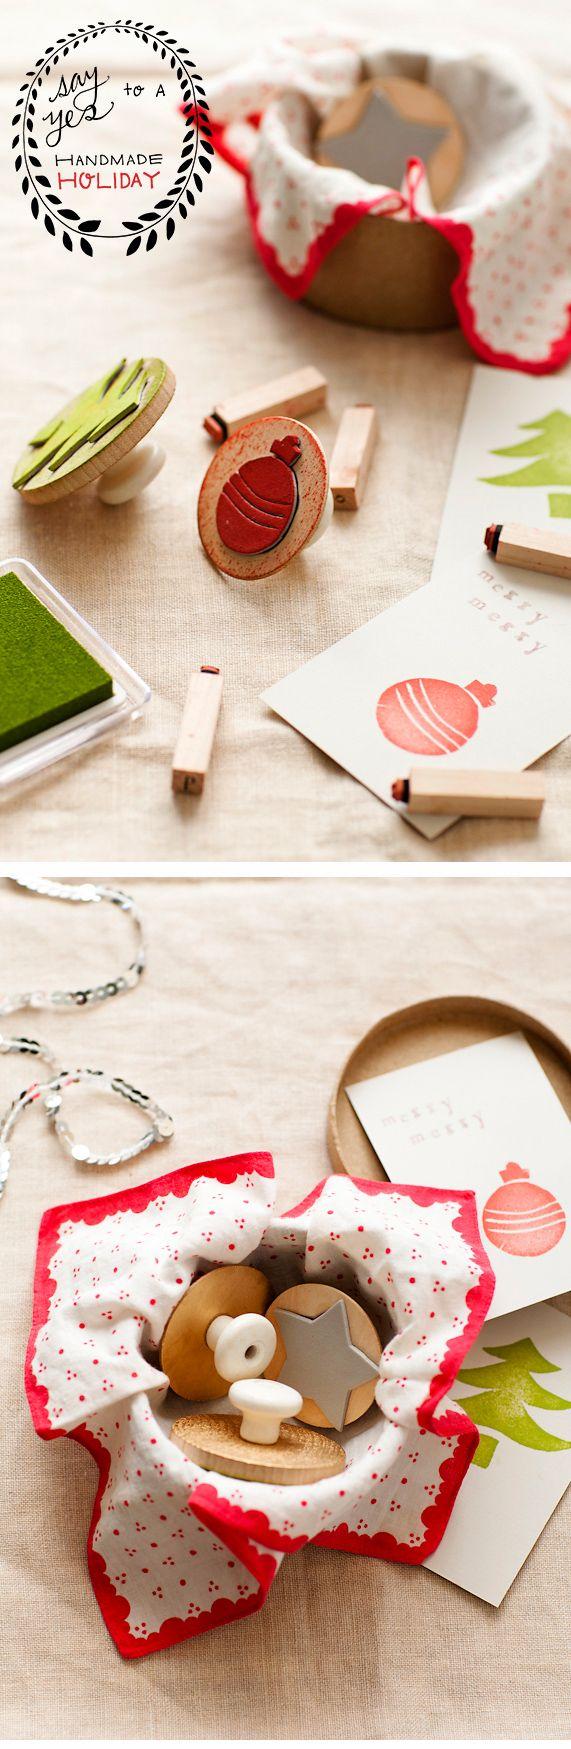 DIY: homemade stamps